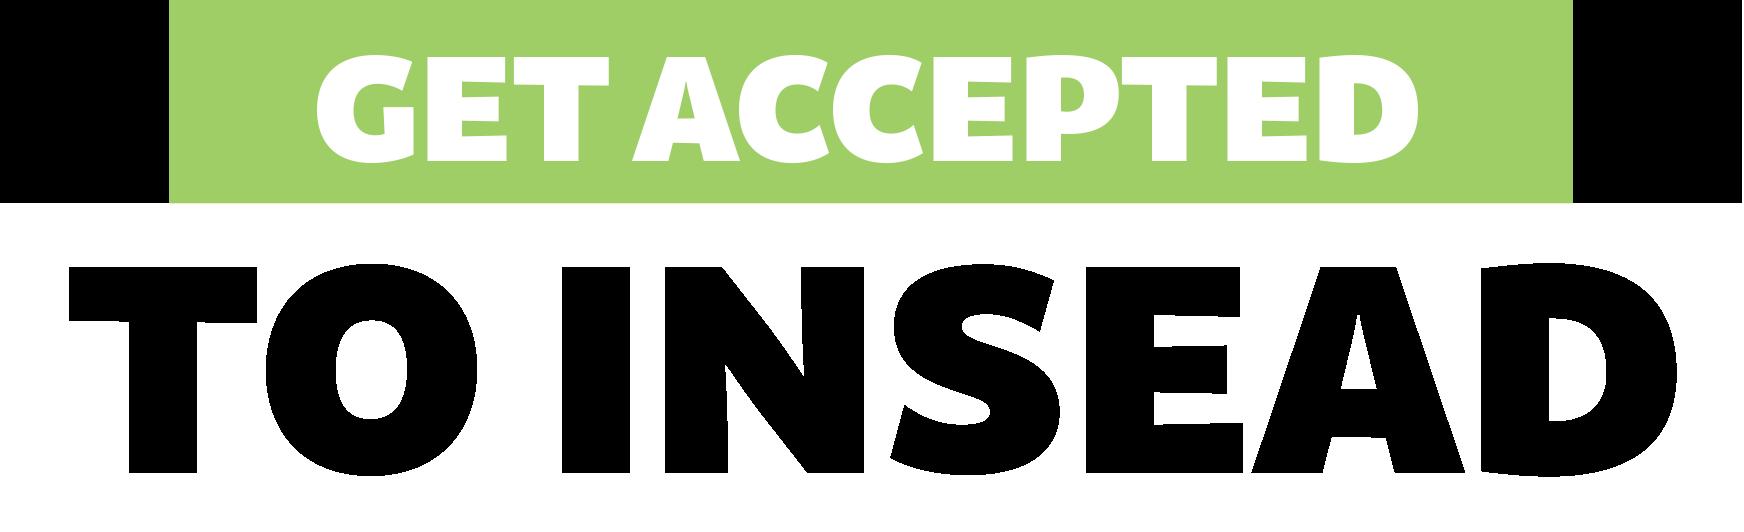 LP_Insead Webinar Words 2019